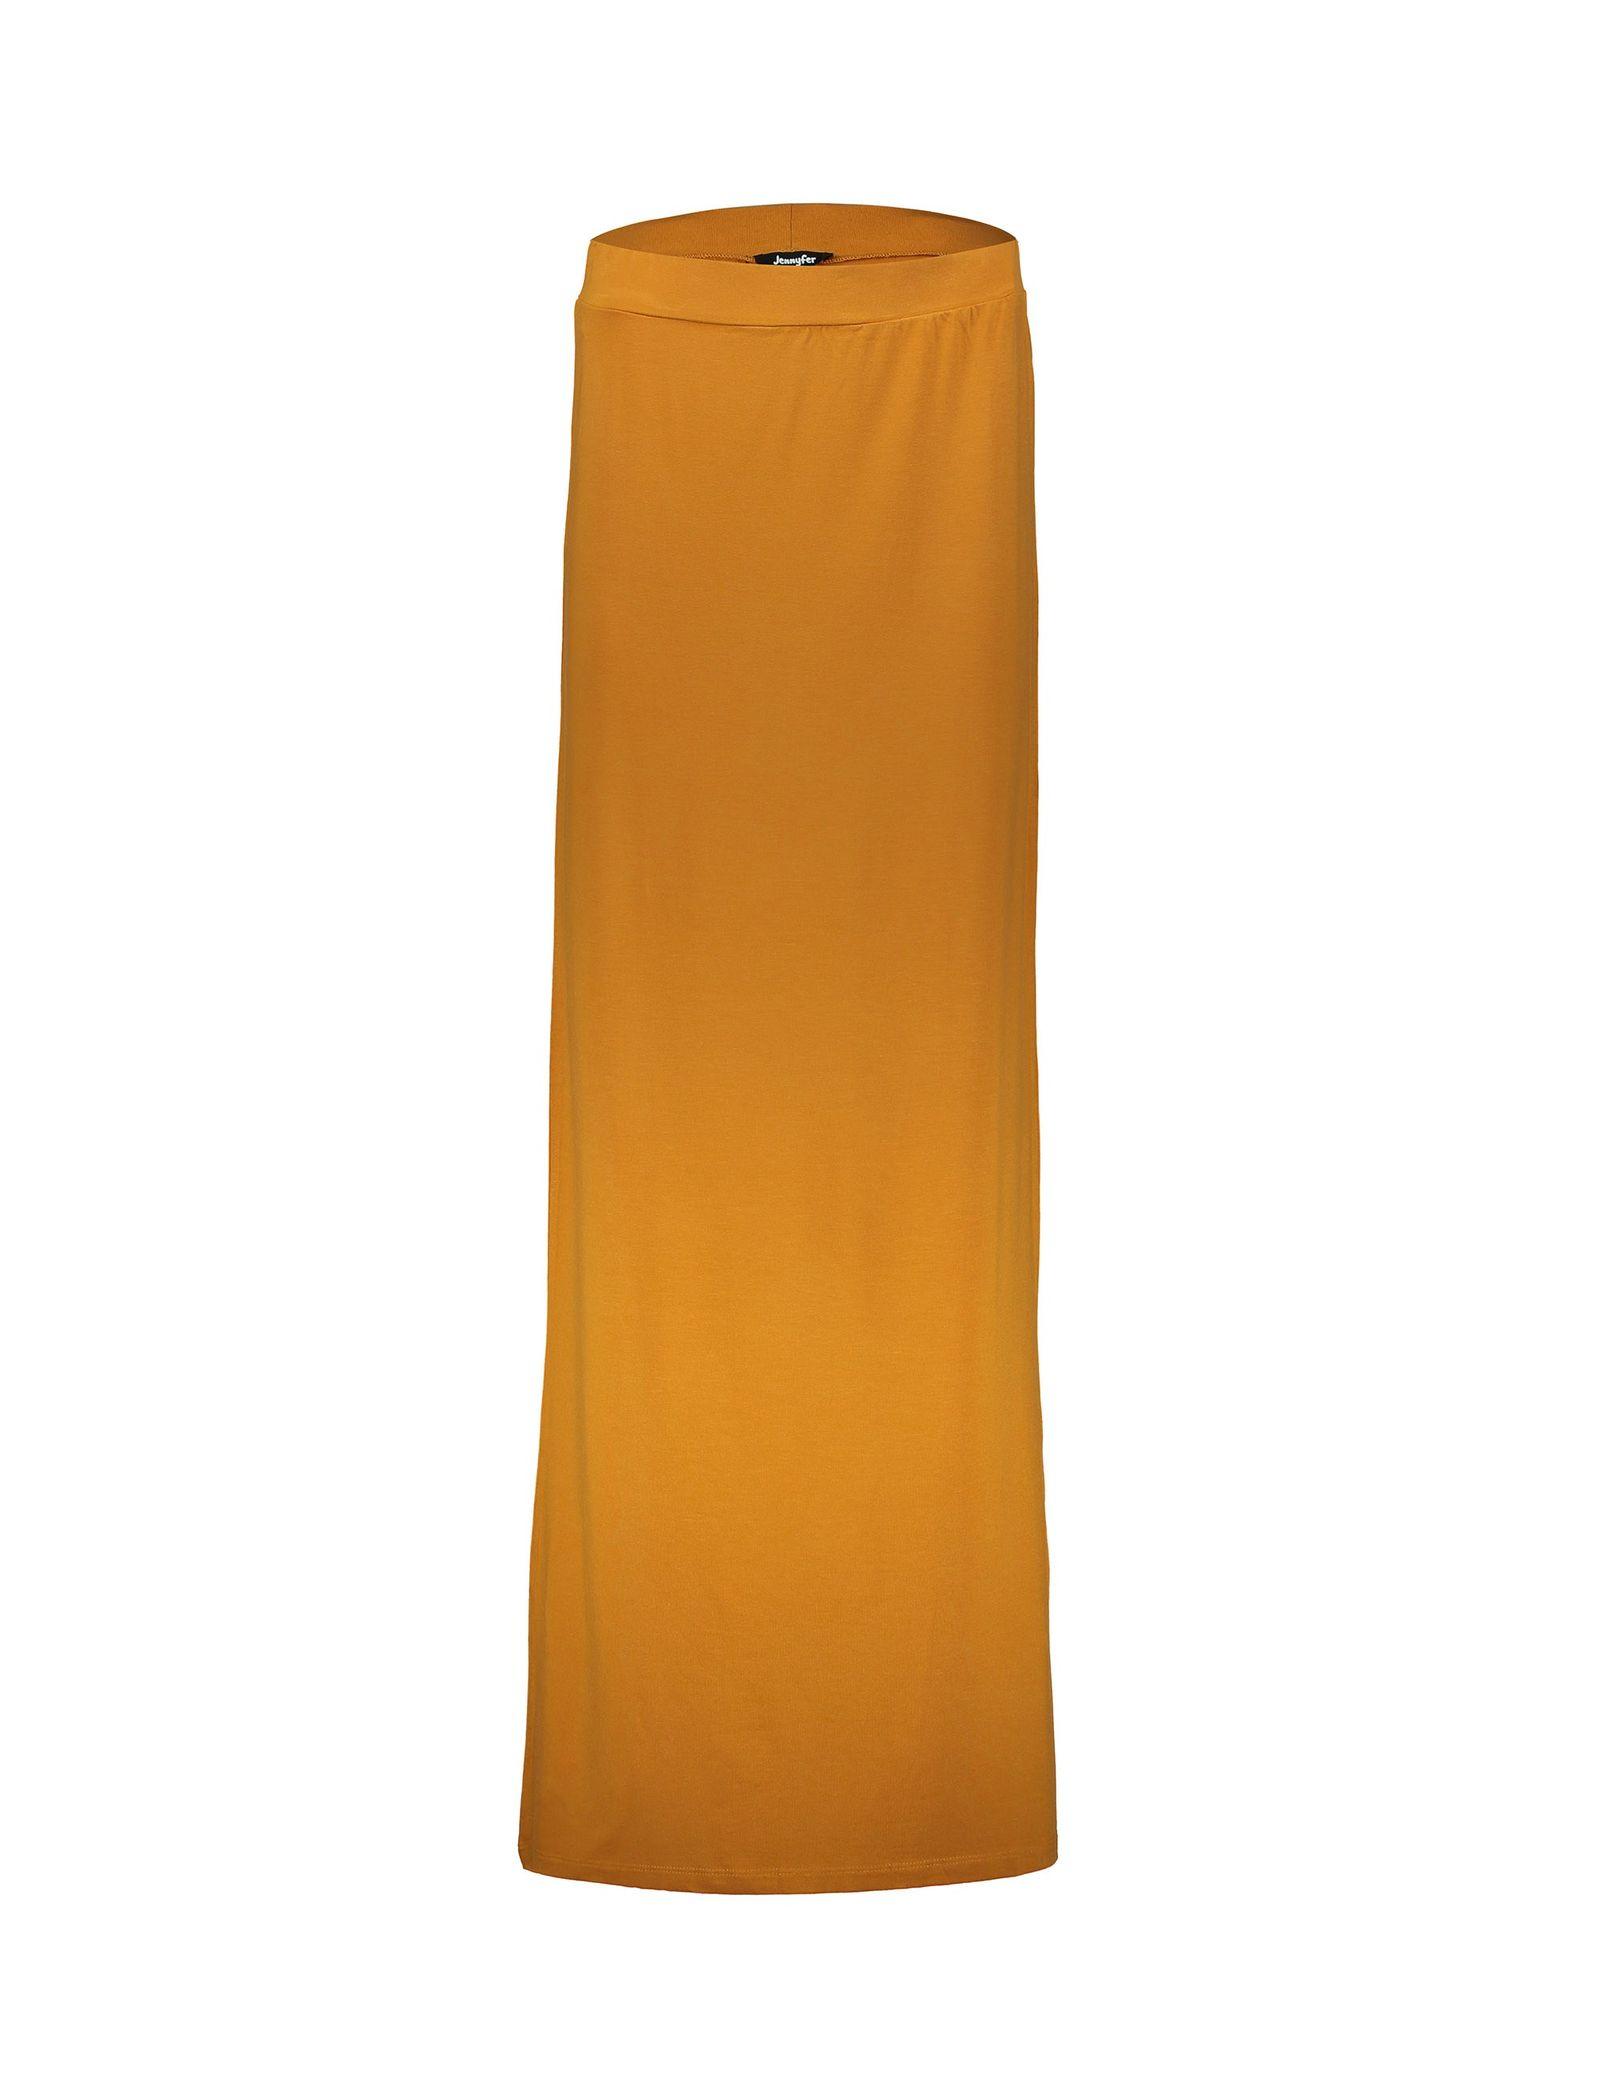 دامن ویسکوز بلند زنانه - جنیفر - خردلي - 1